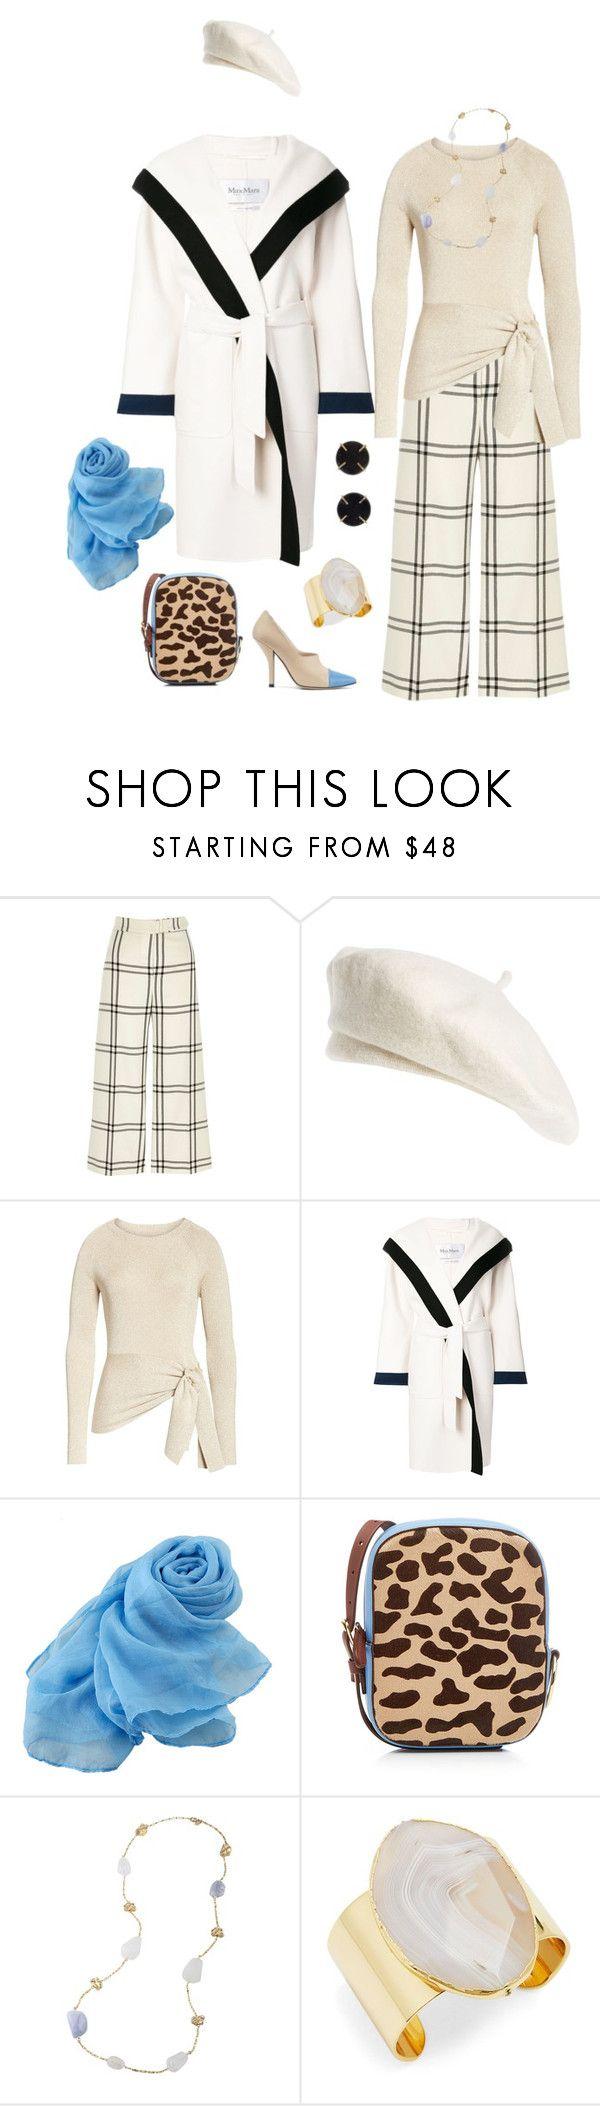 """Untitled #1780"" by clothes-wise ❤ liked on Polyvore featuring River Island, Brixton, 3.1 Phillip Lim, MaxMara, Fendi, Diane Von Furstenberg, Carolee and Melissa Joy Manning"